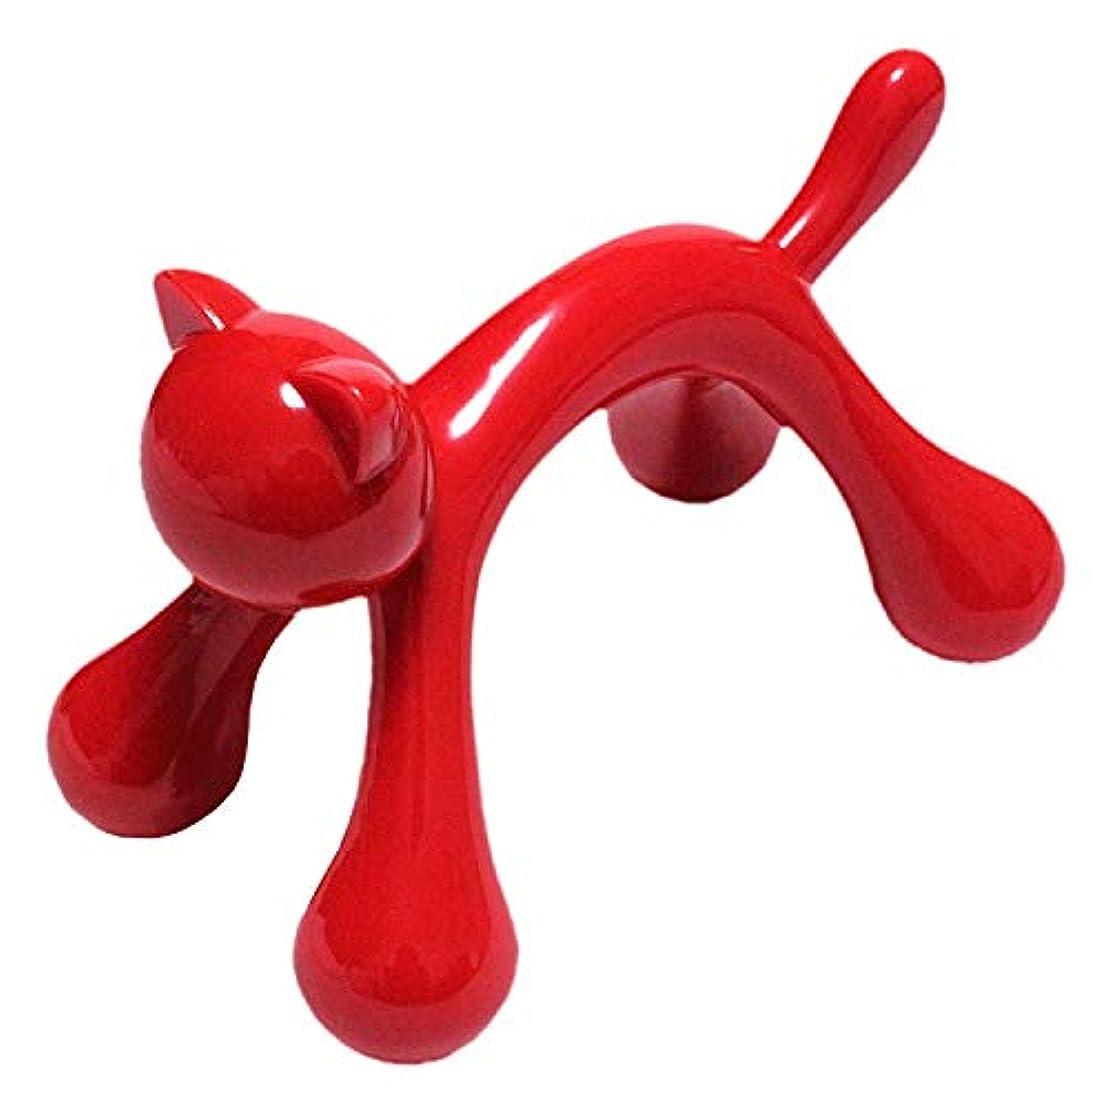 Suu マッサージ棒 ツボ押し 握りタイプ 背中 首 肩こり等の疲れ解消 可愛いネコ型 (赤)